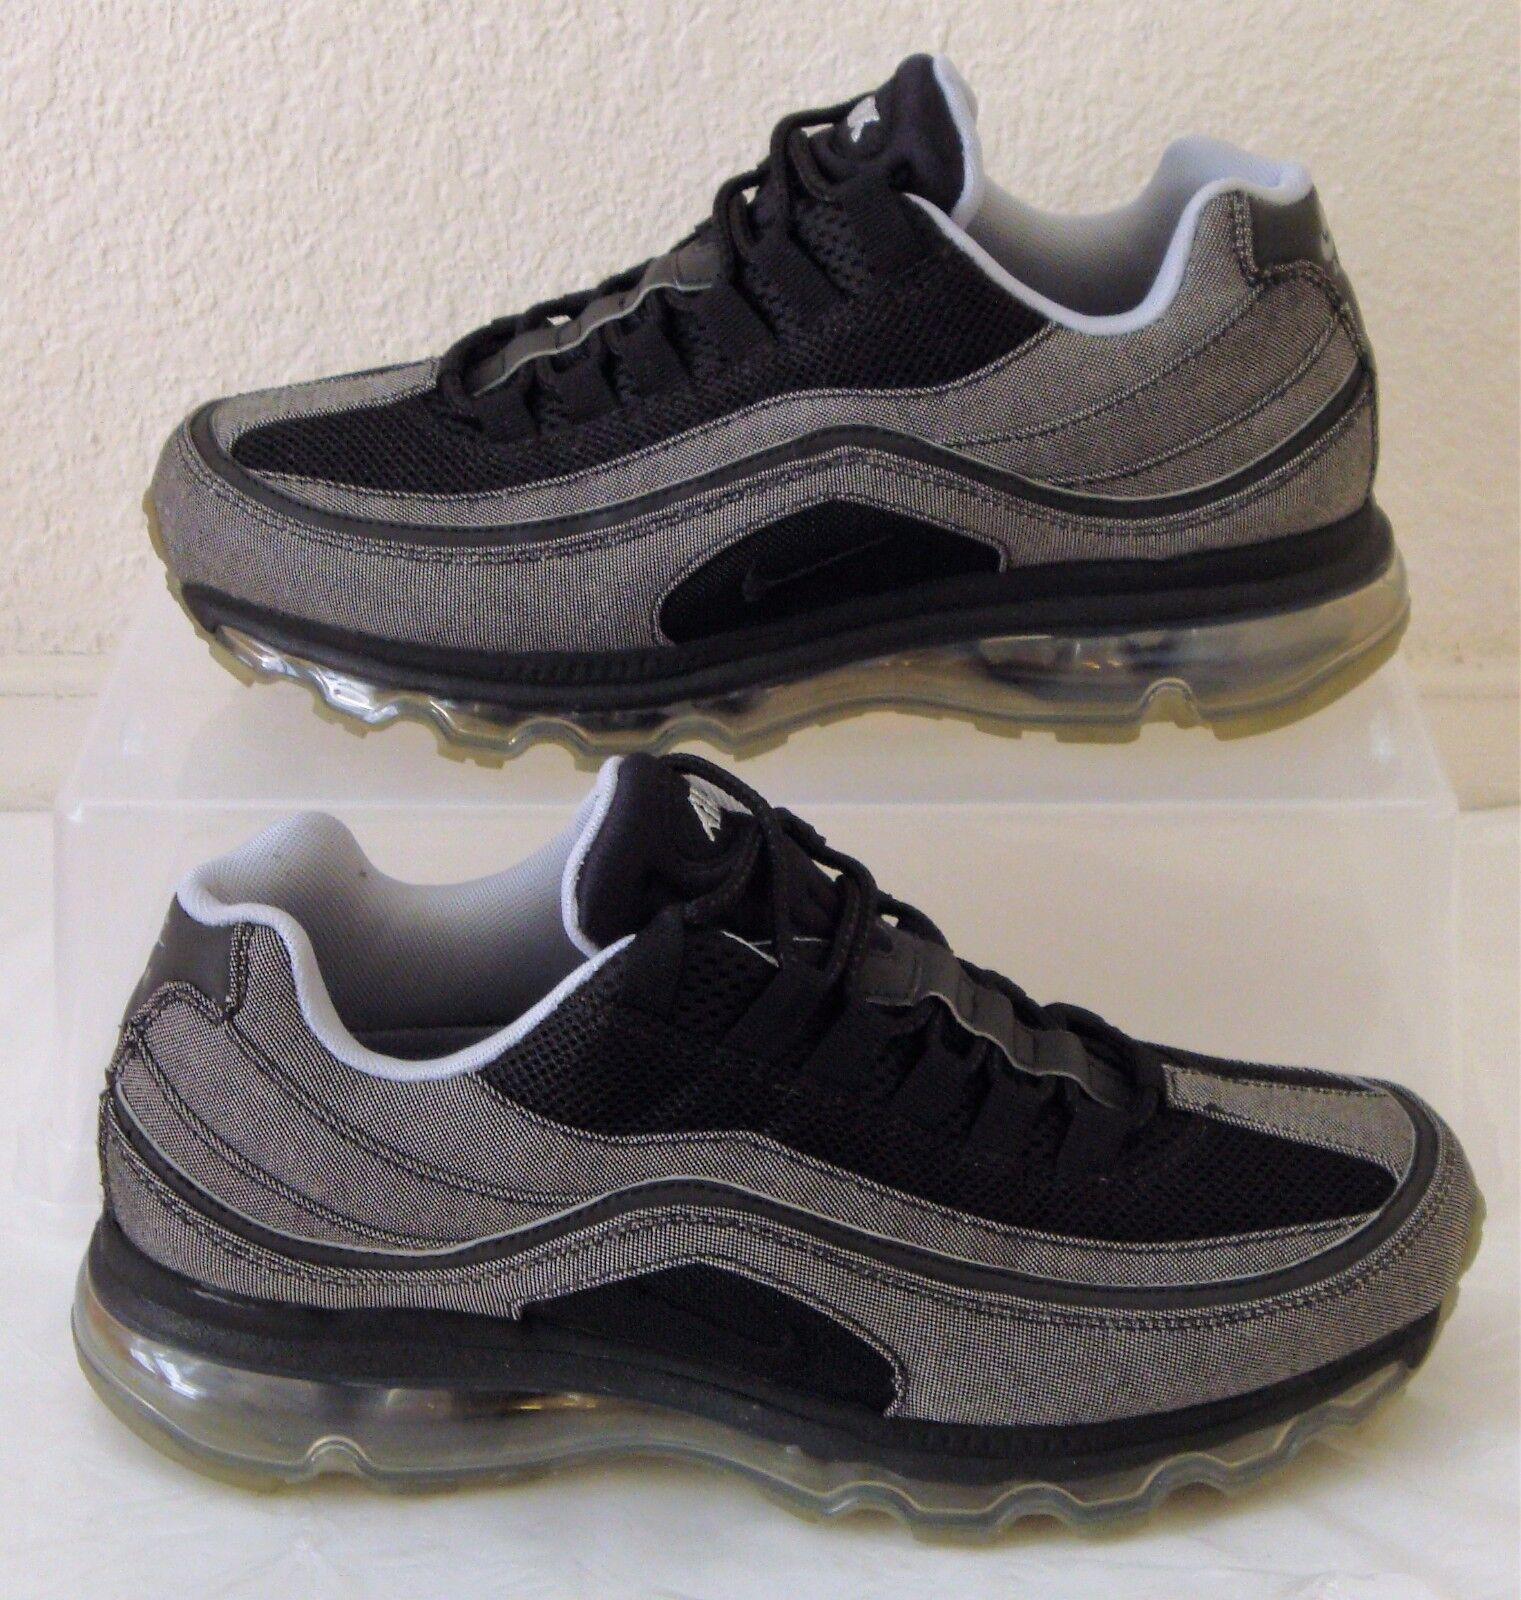 New Vintage HOA Nike Shoes Air Max 24 7 Black Silver Mens US Size 7